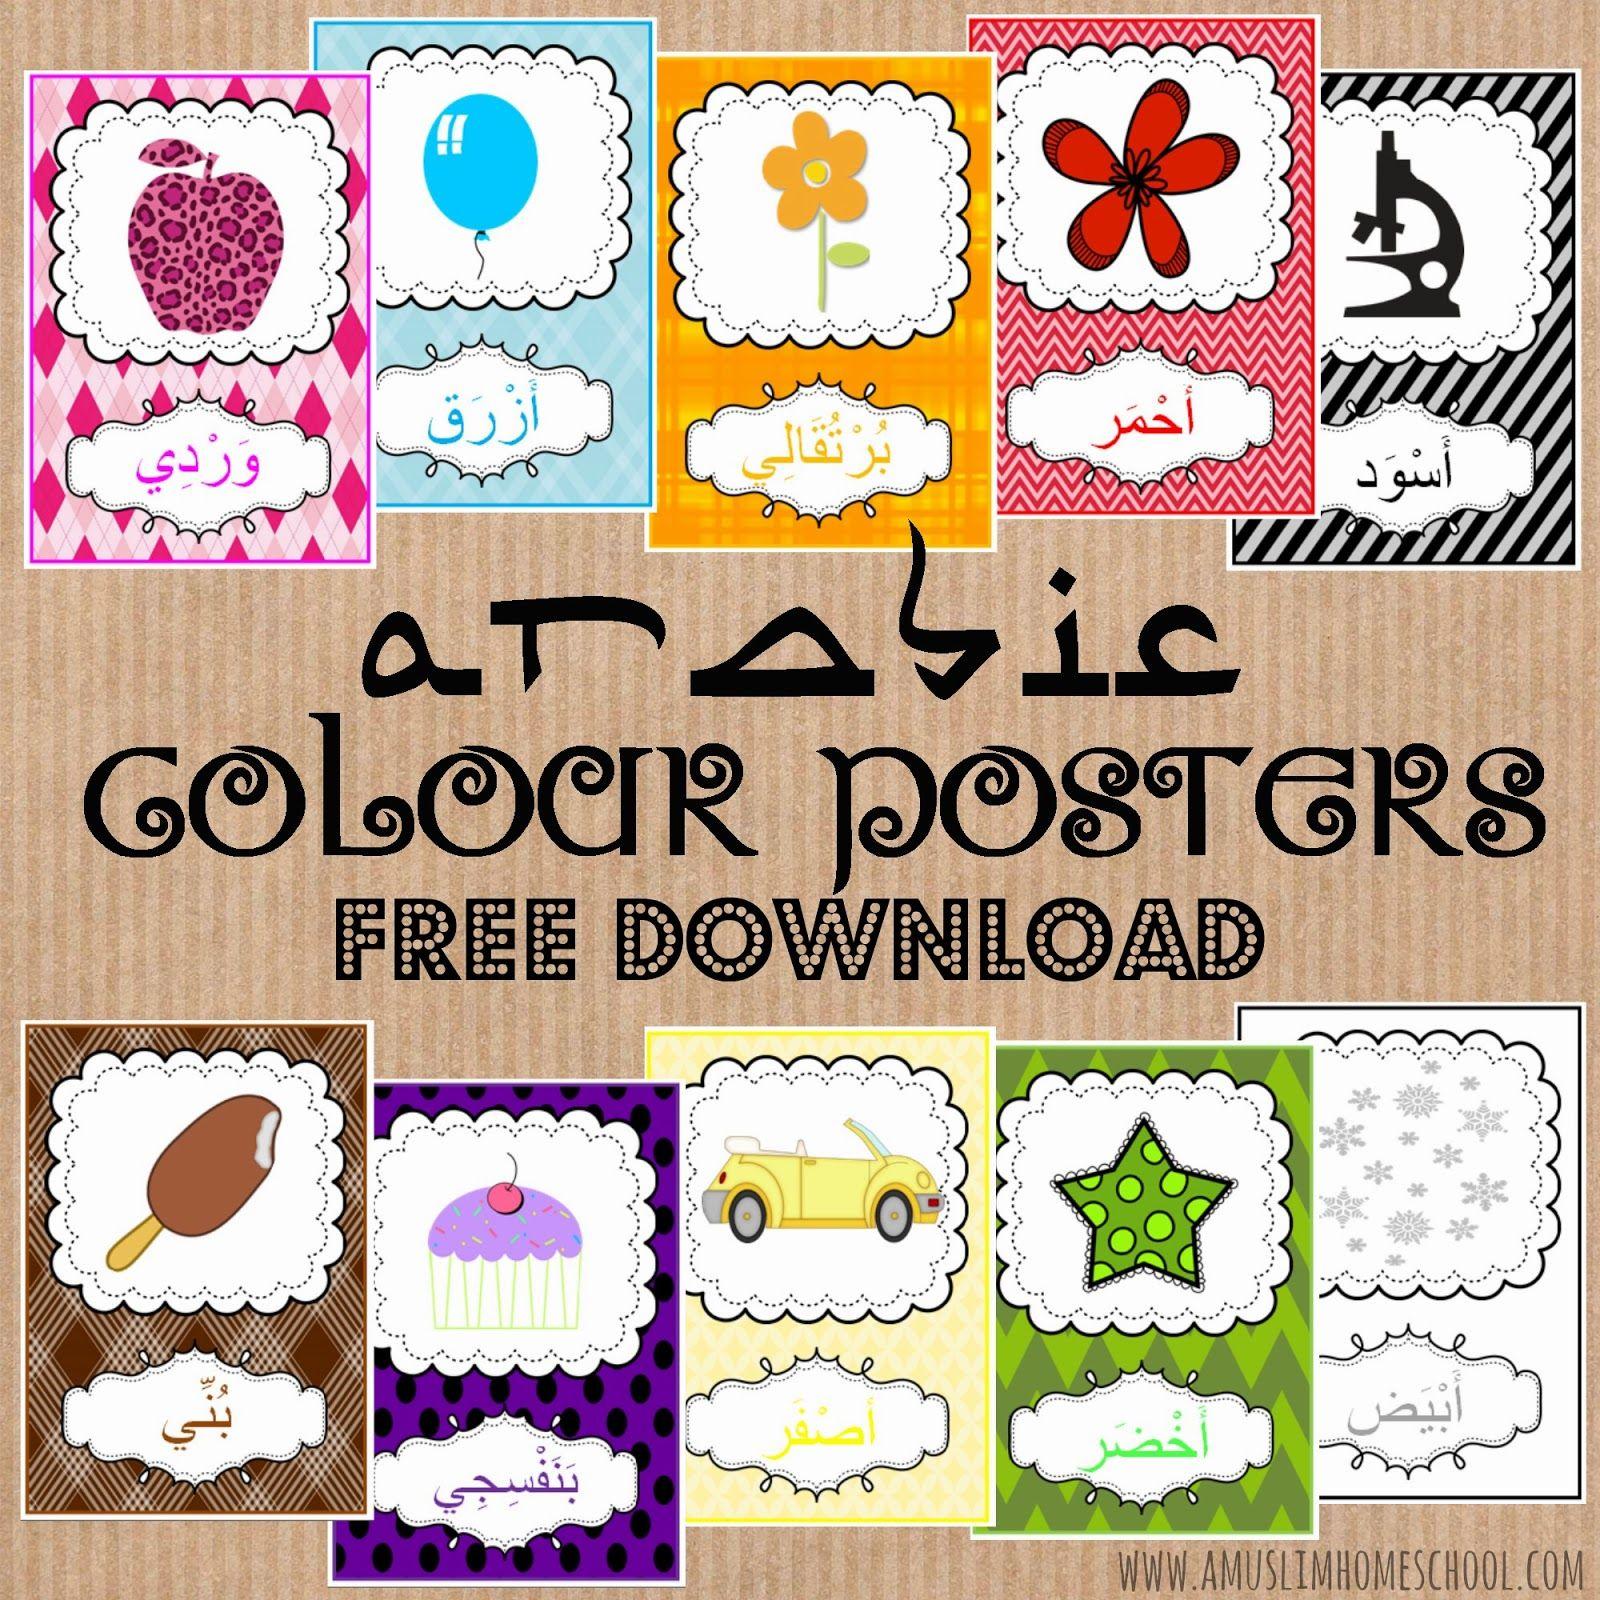 Printable Arabic Colour Posters